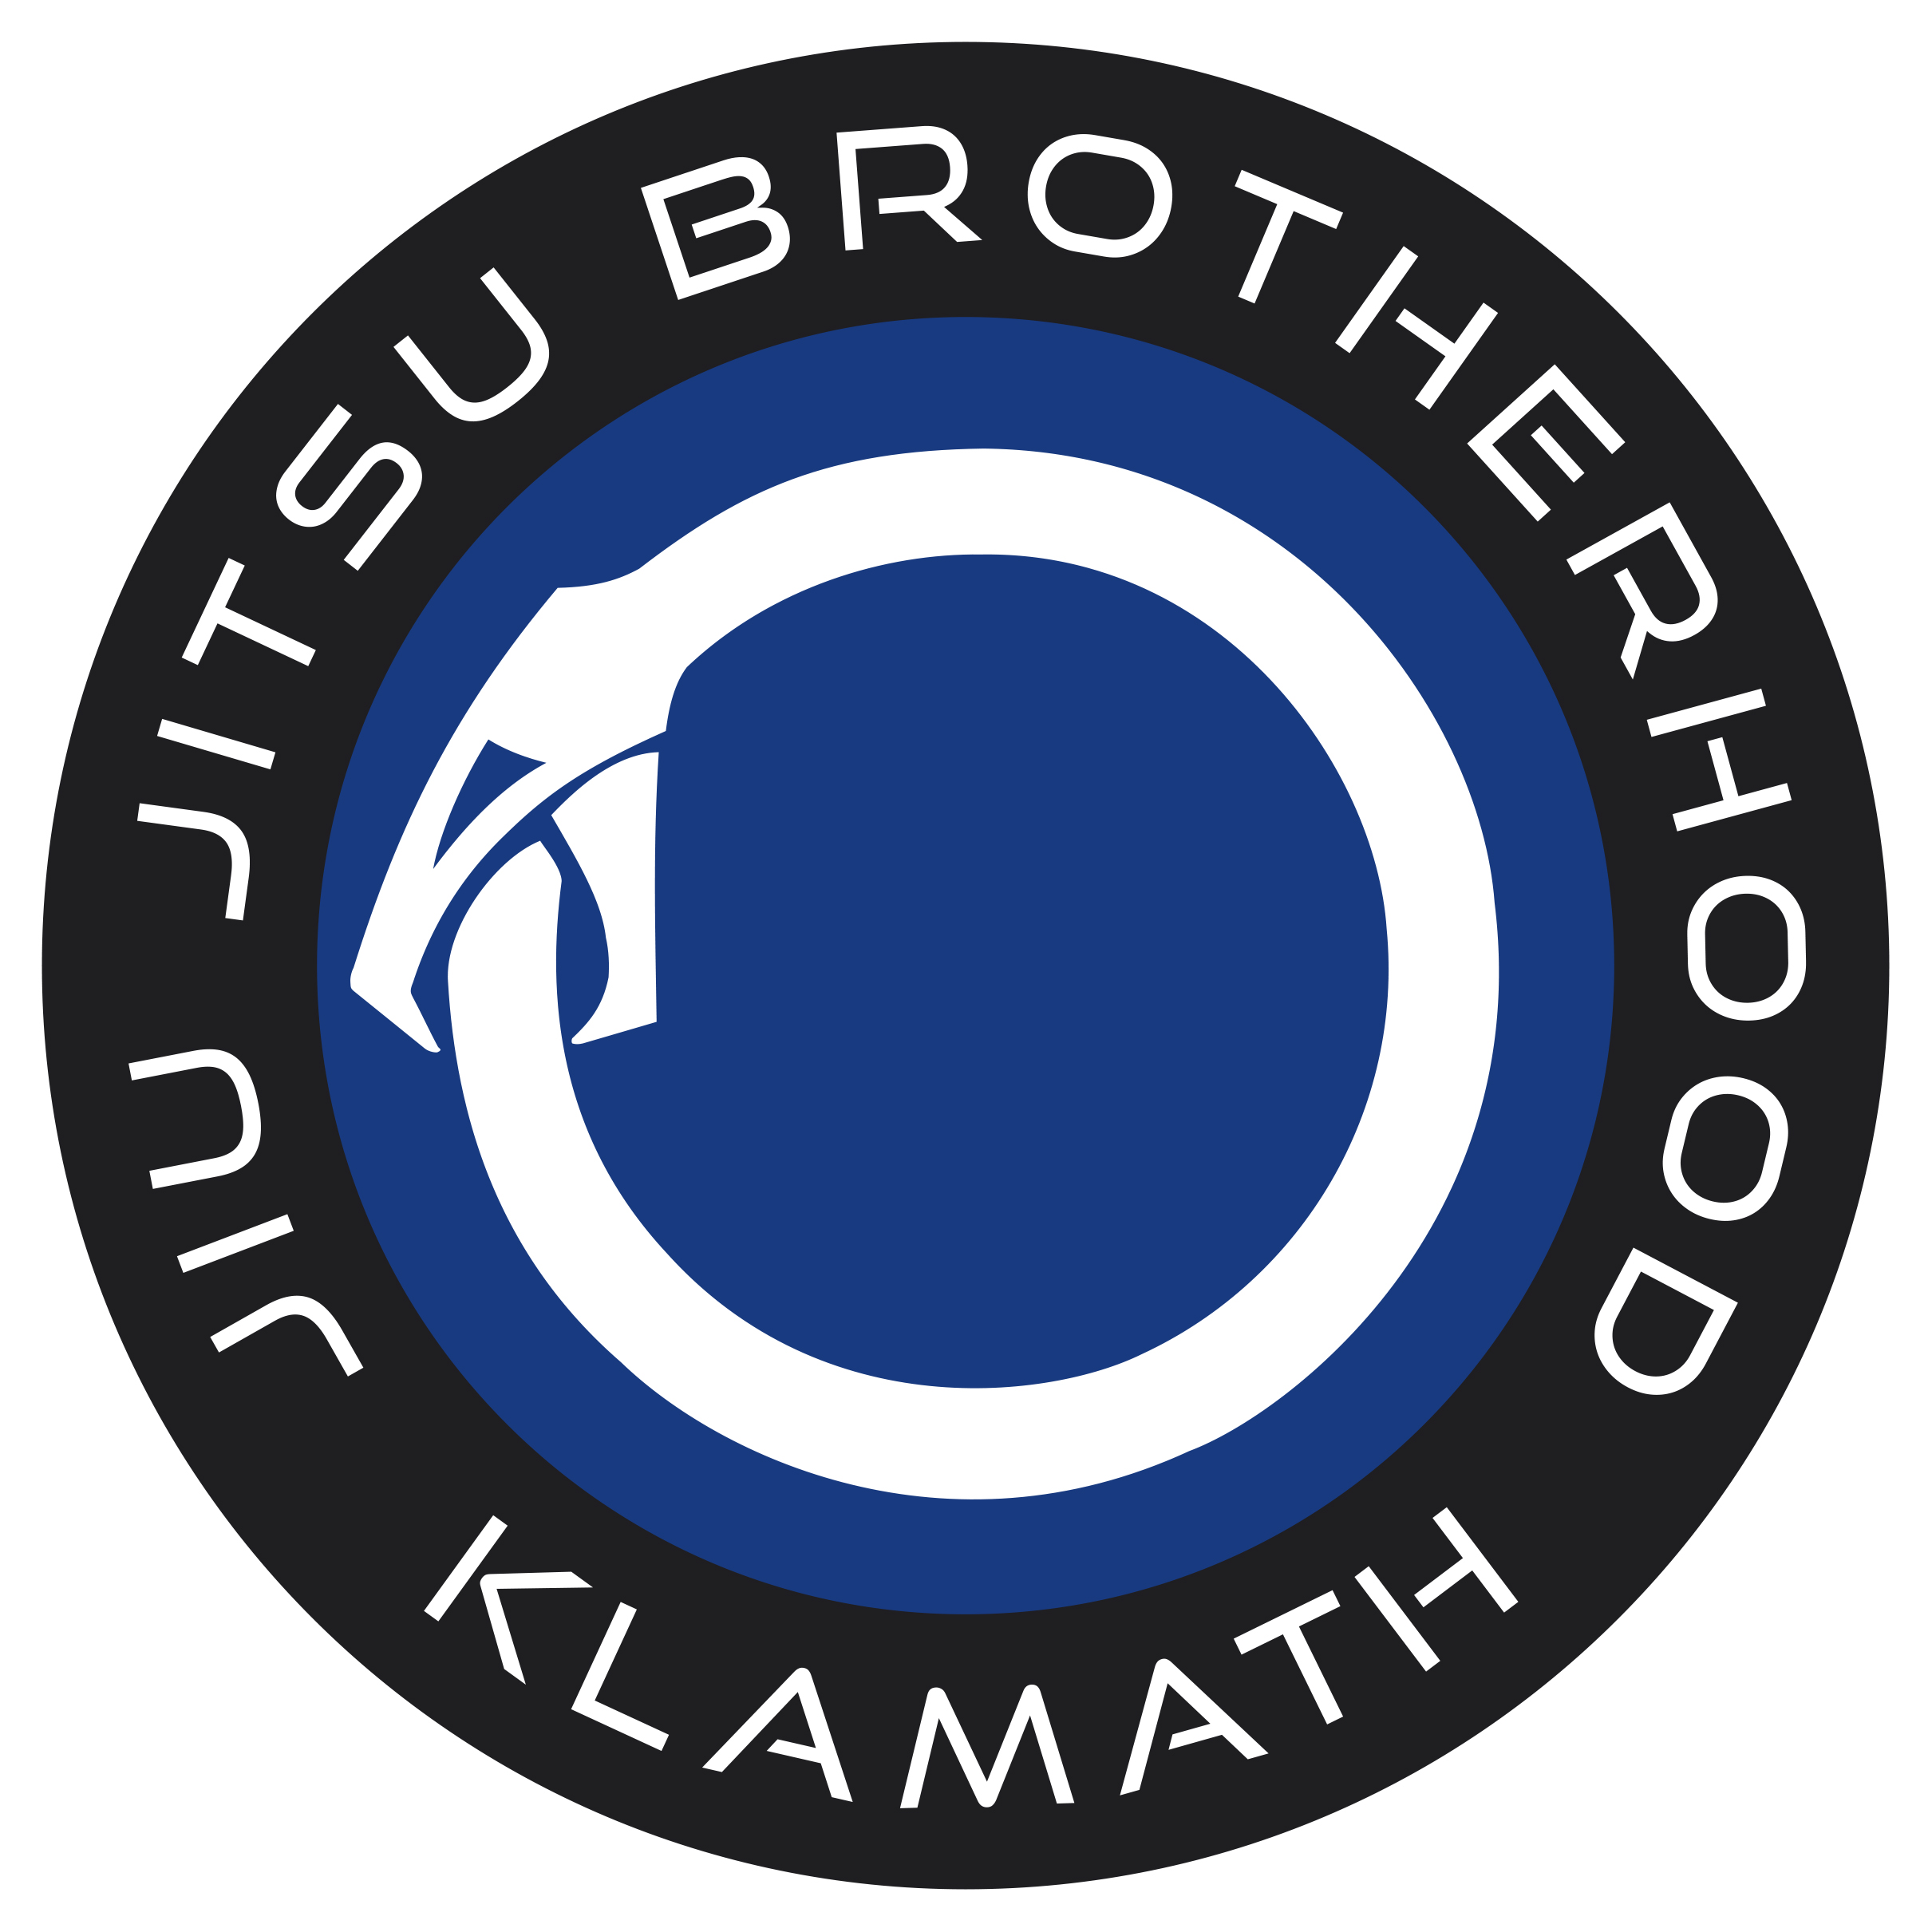 JJB Klamath Logo.jpeg